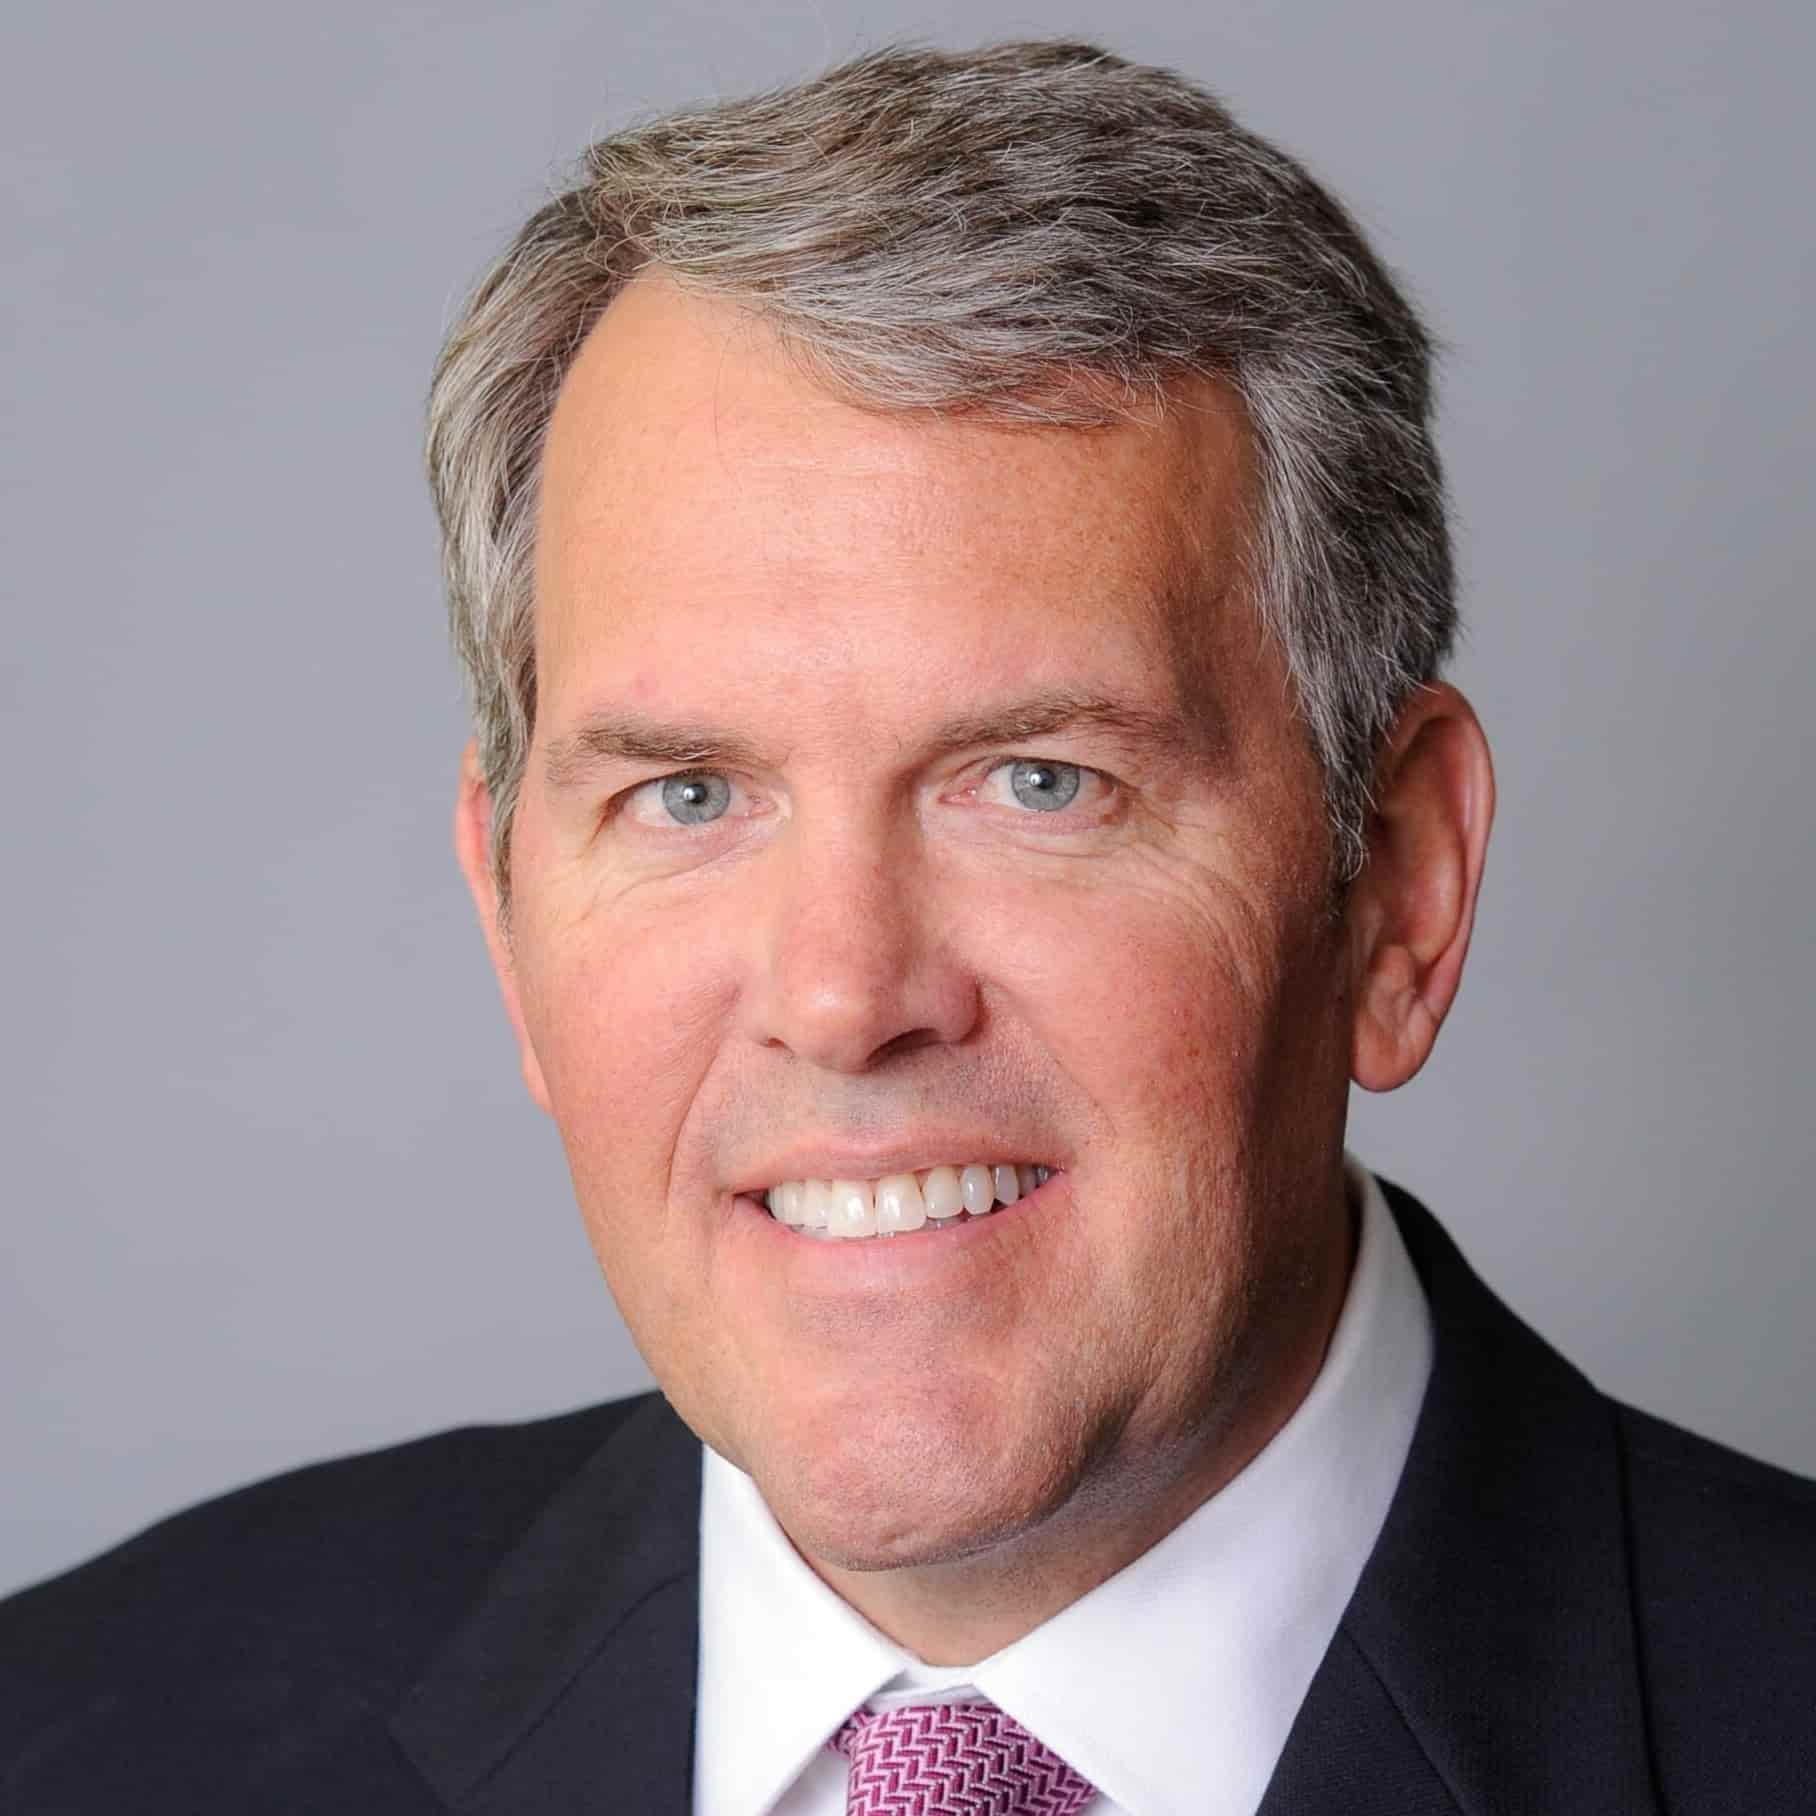 Chief Legal Officer Vince Toenjes